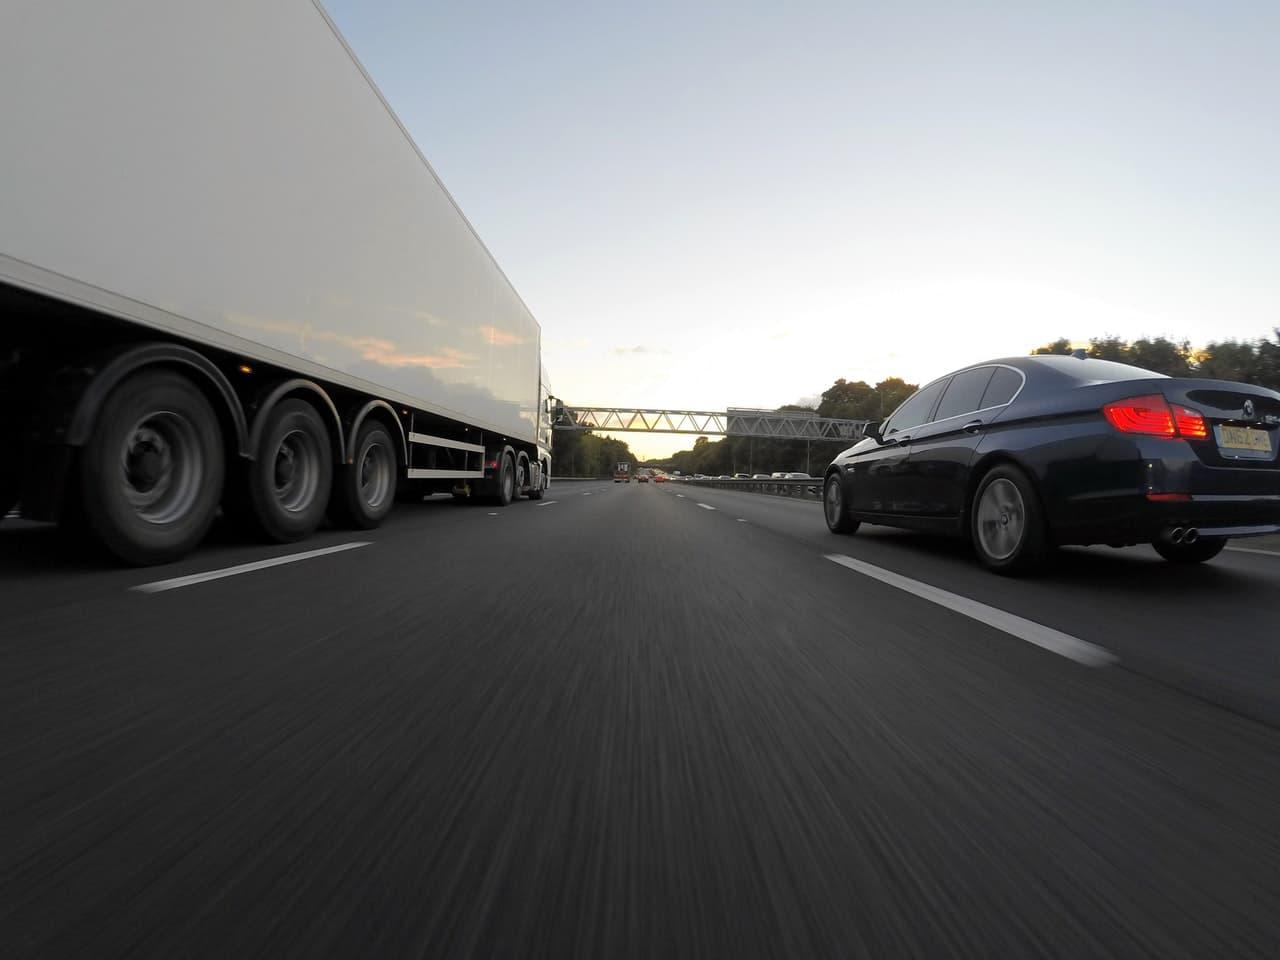 Big Truck Accident Header Image